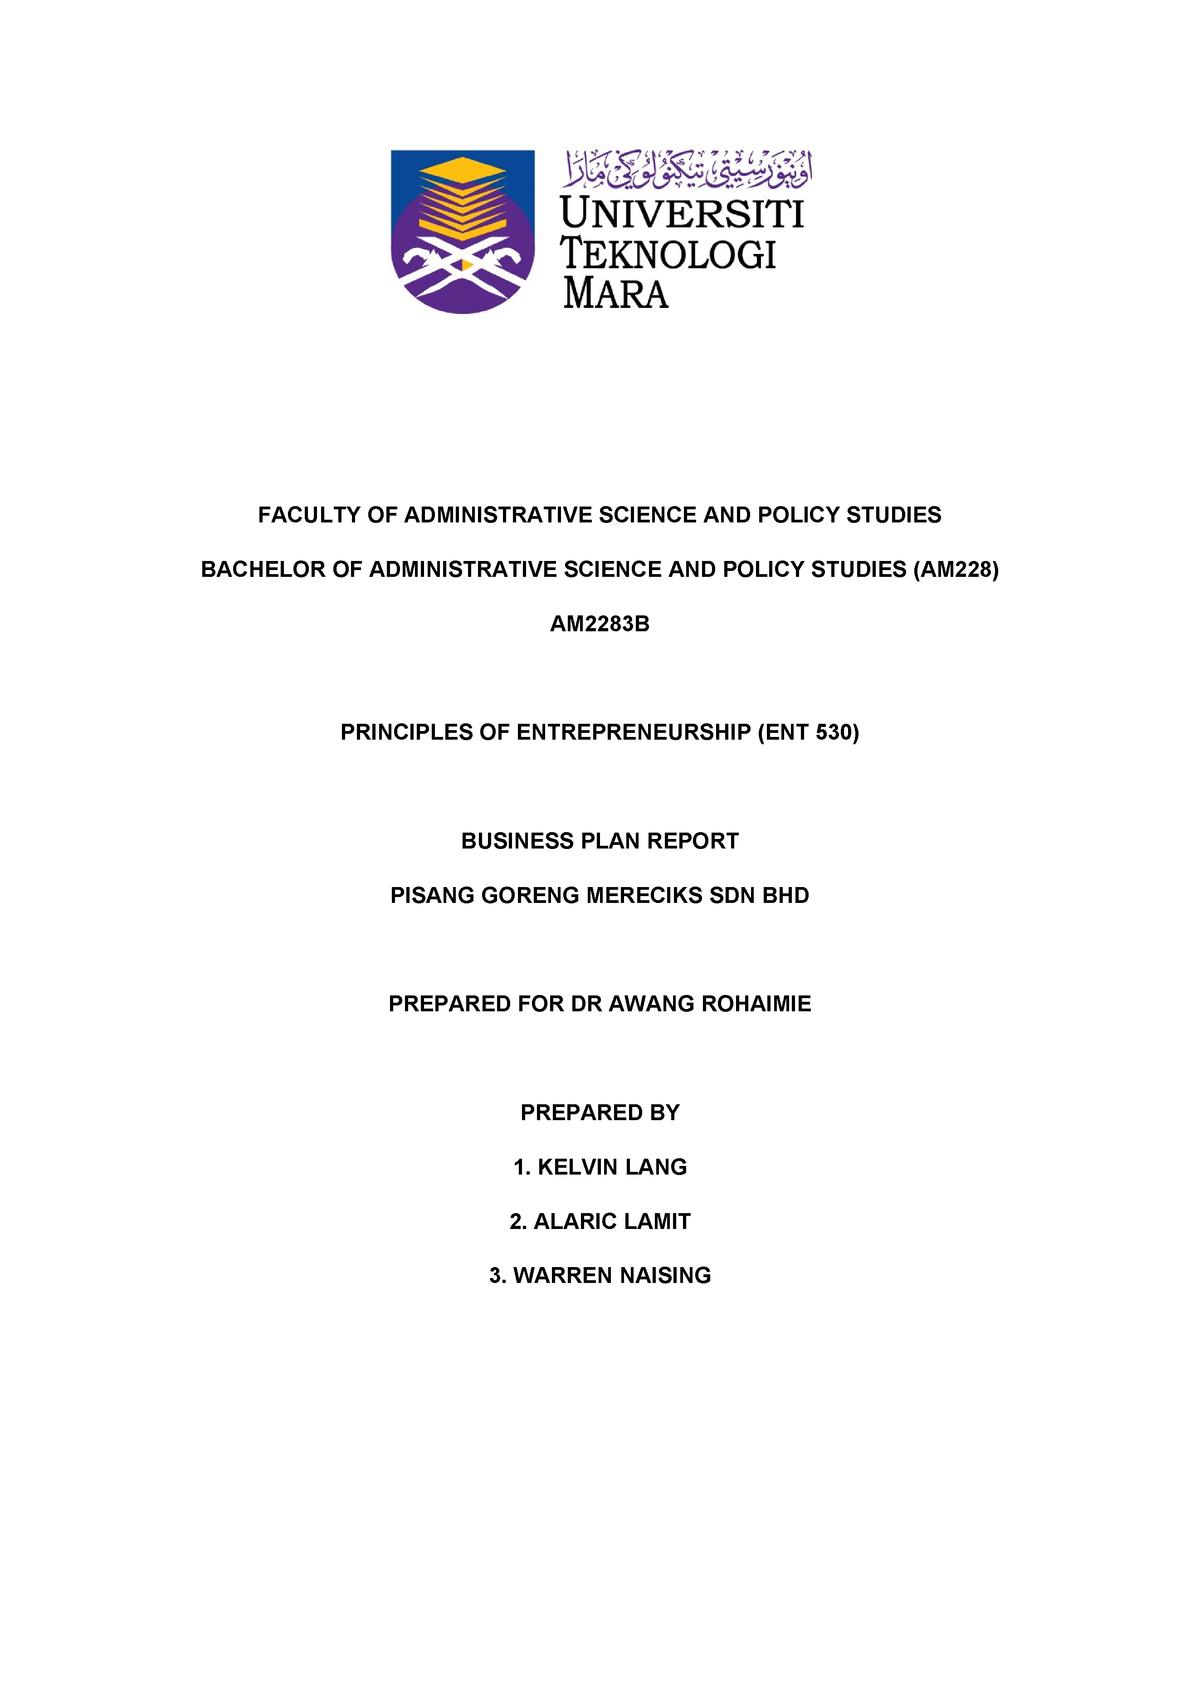 Ent530 Business Proposal Report Studocu